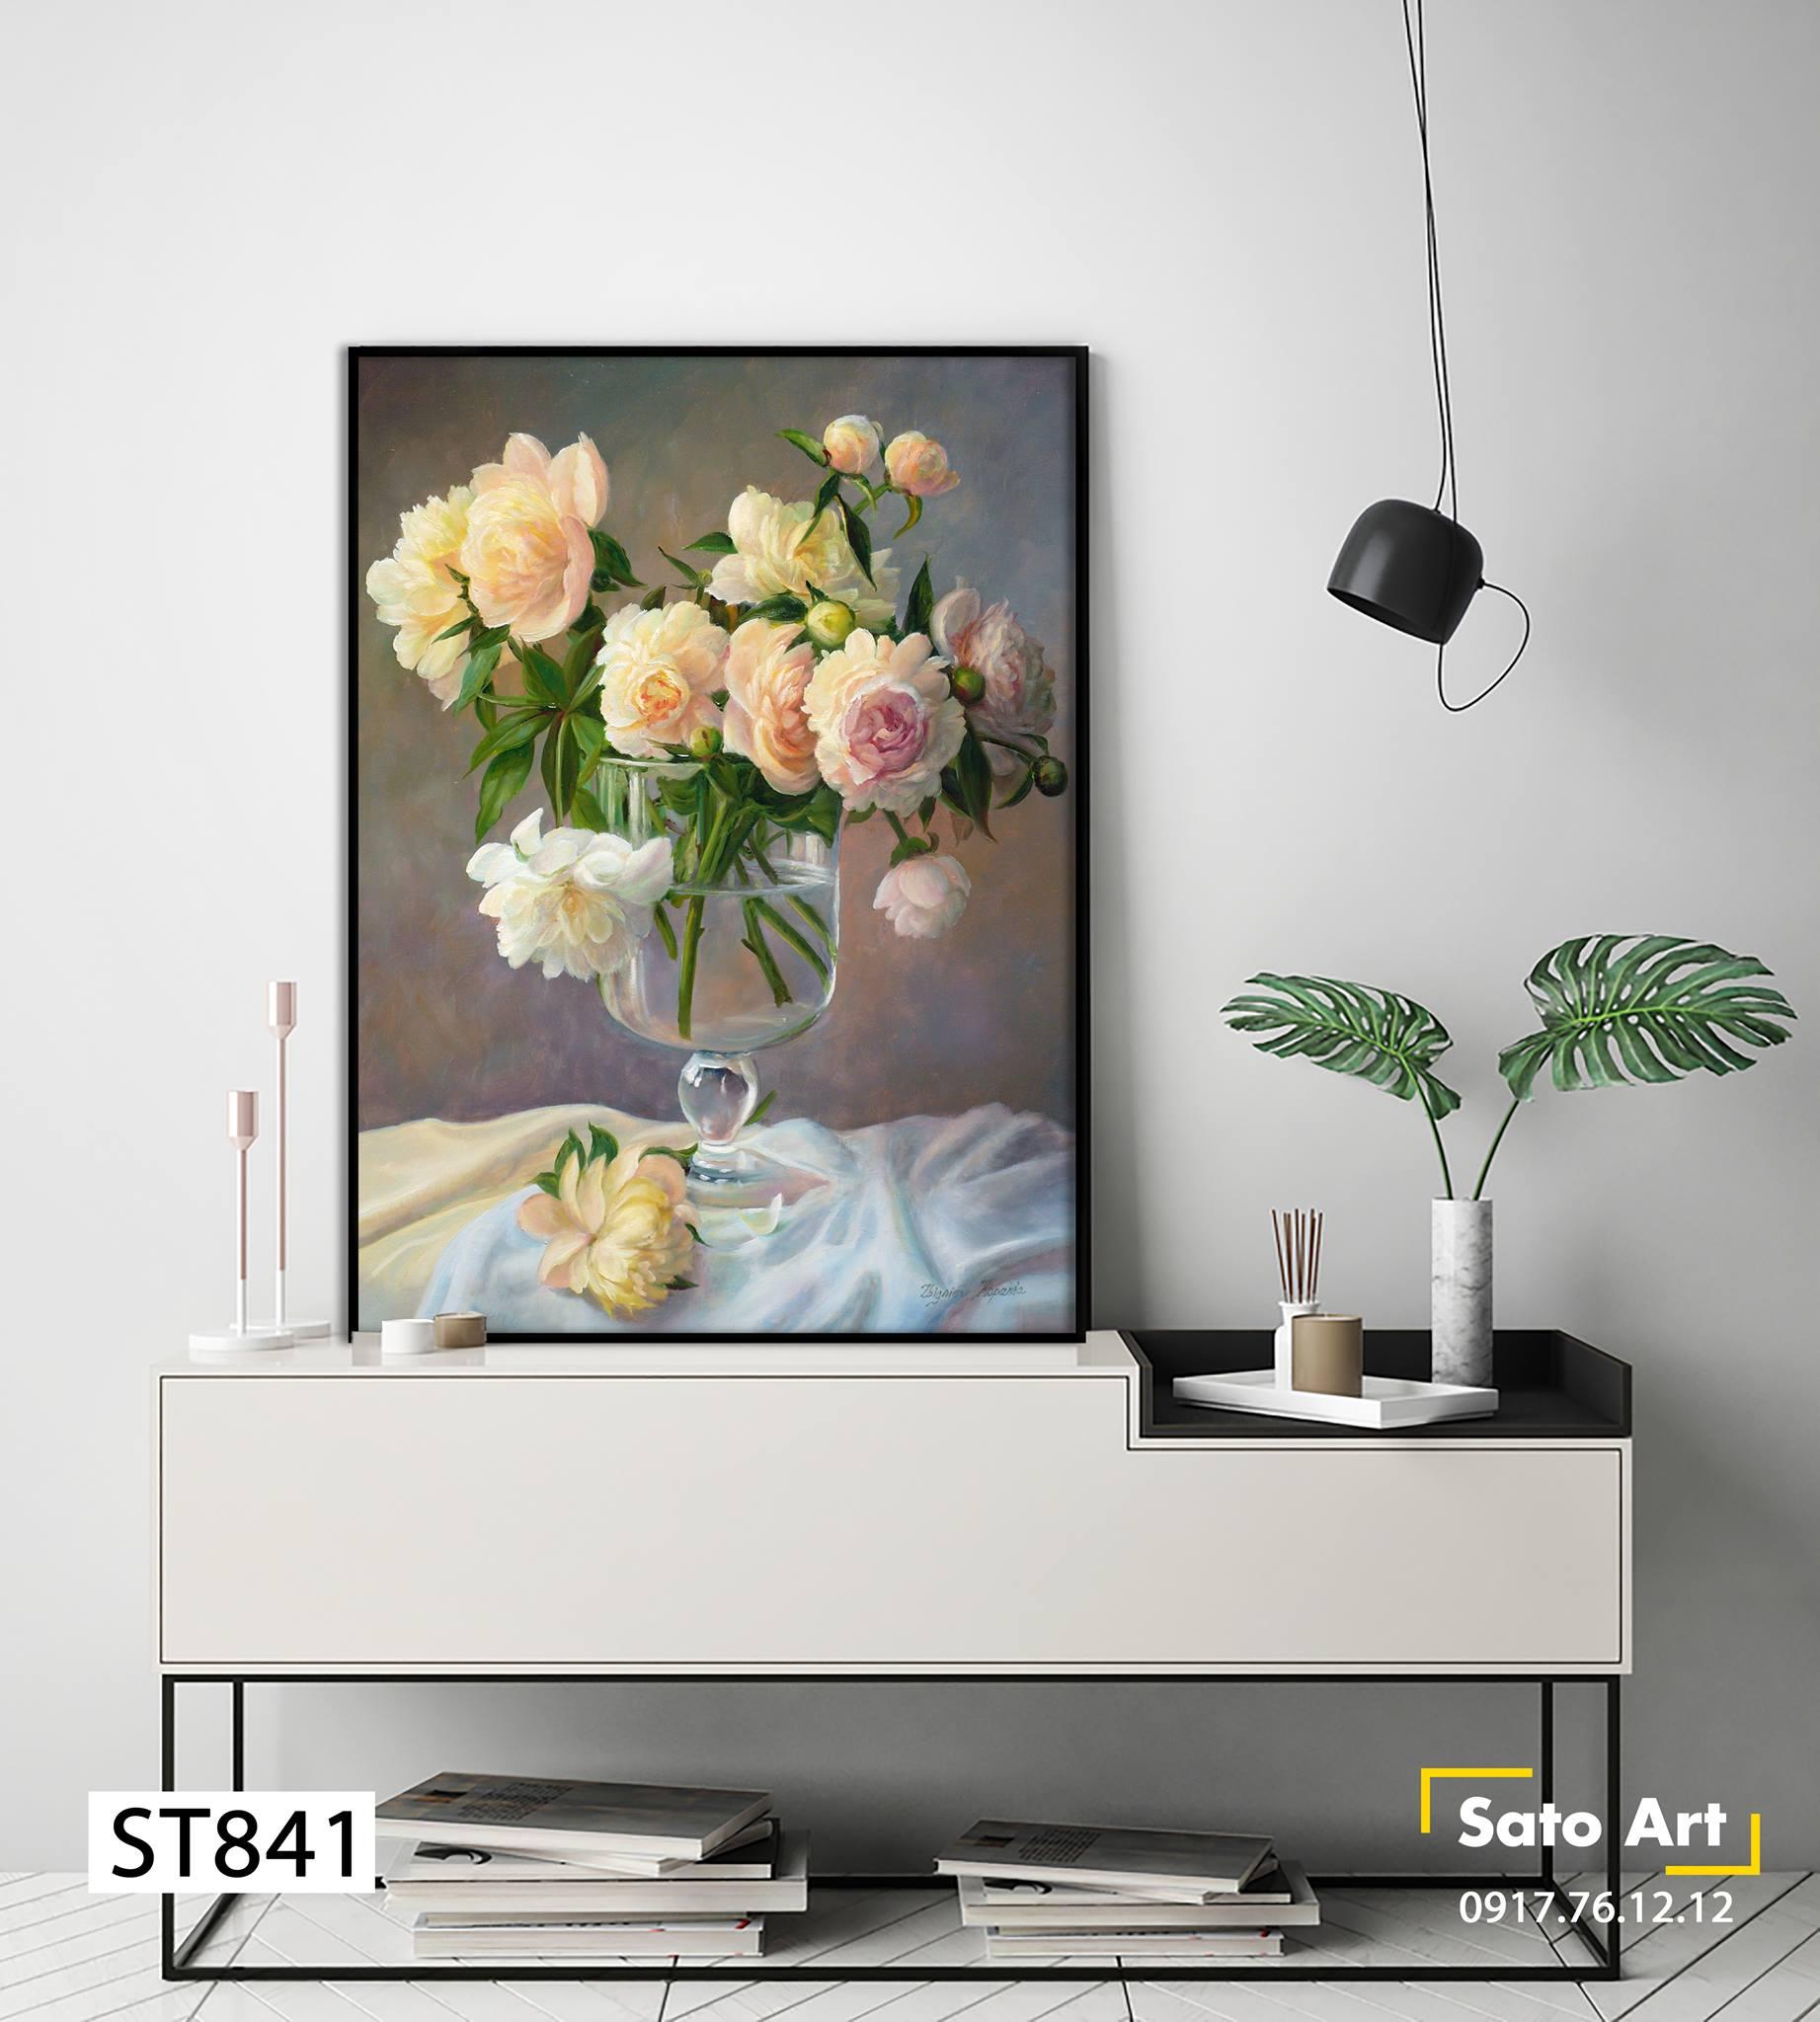 Mua tranh hoa hồng